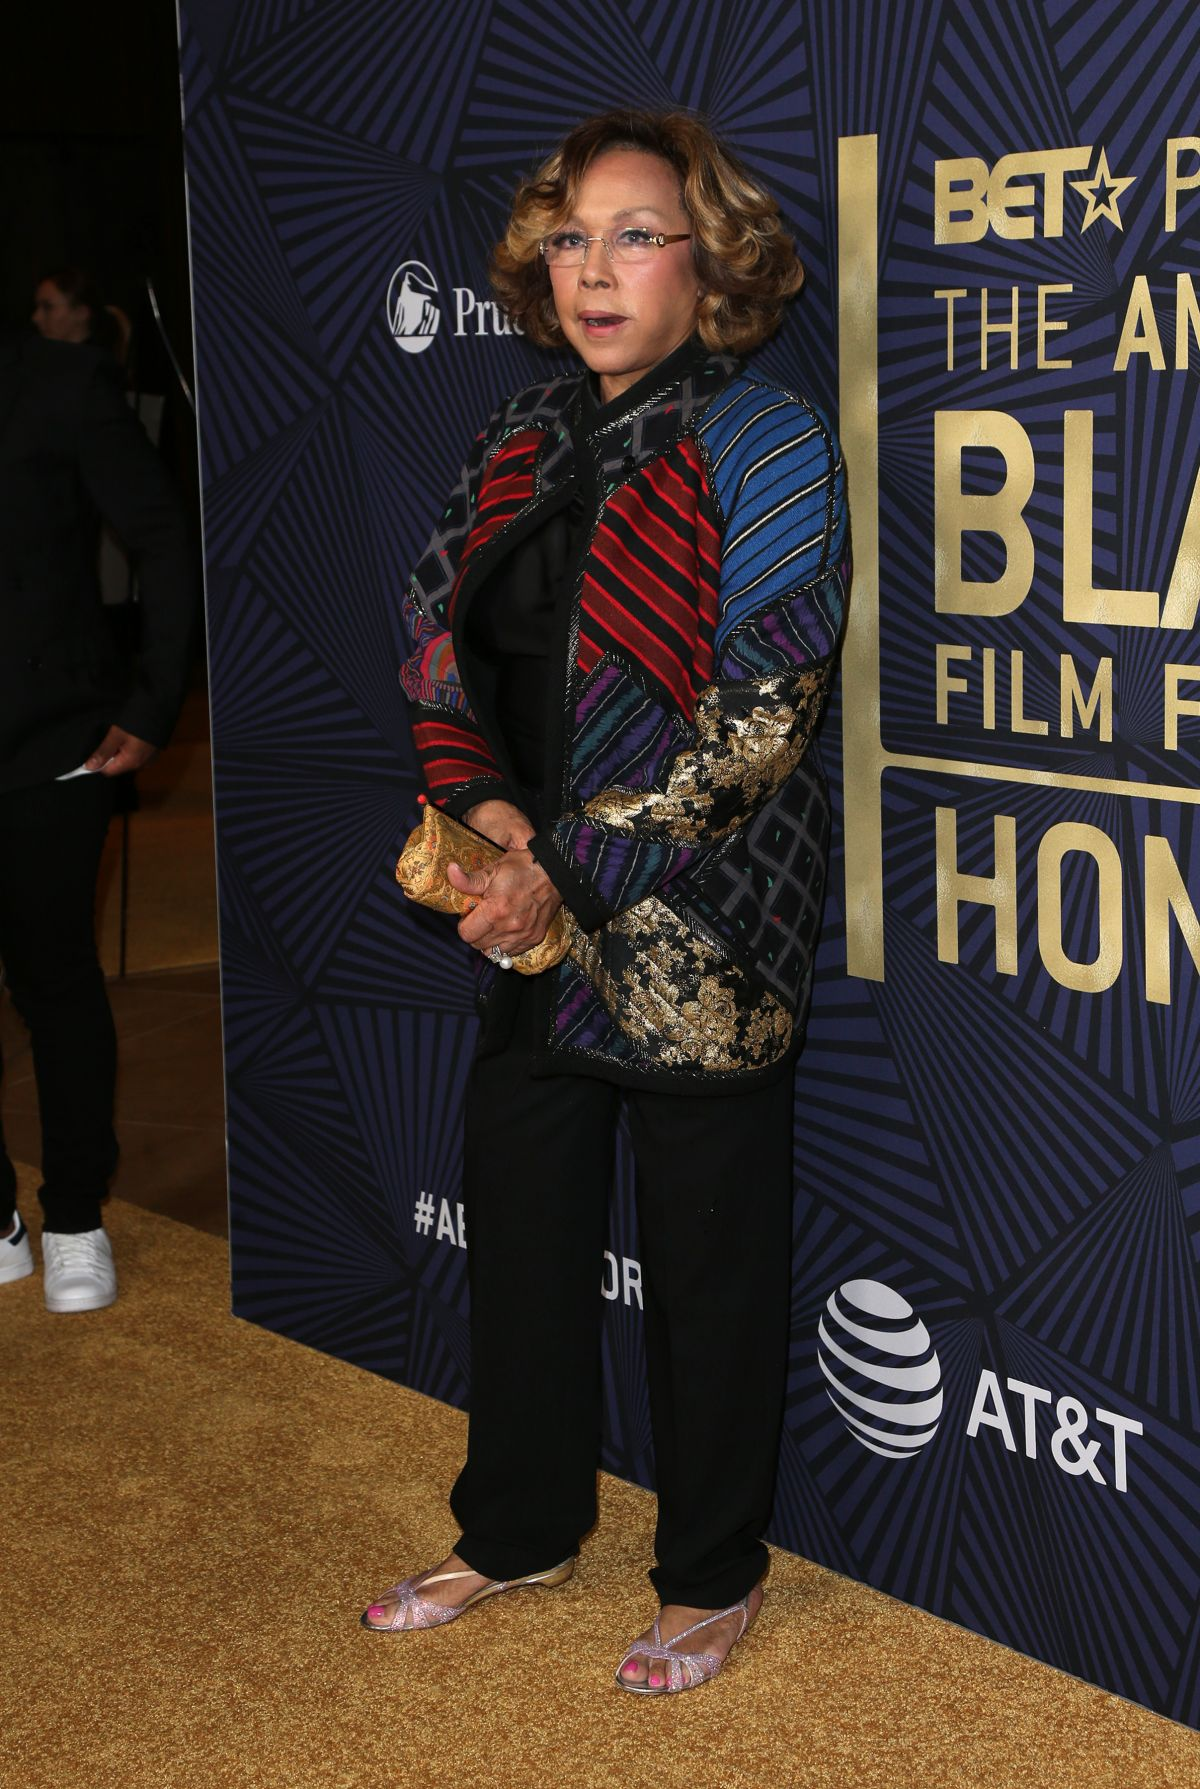 DIAHANN CARROLL at Bet's 2017 American Black Film Festival Honors Awards in Beverly Hills 02/17/2017